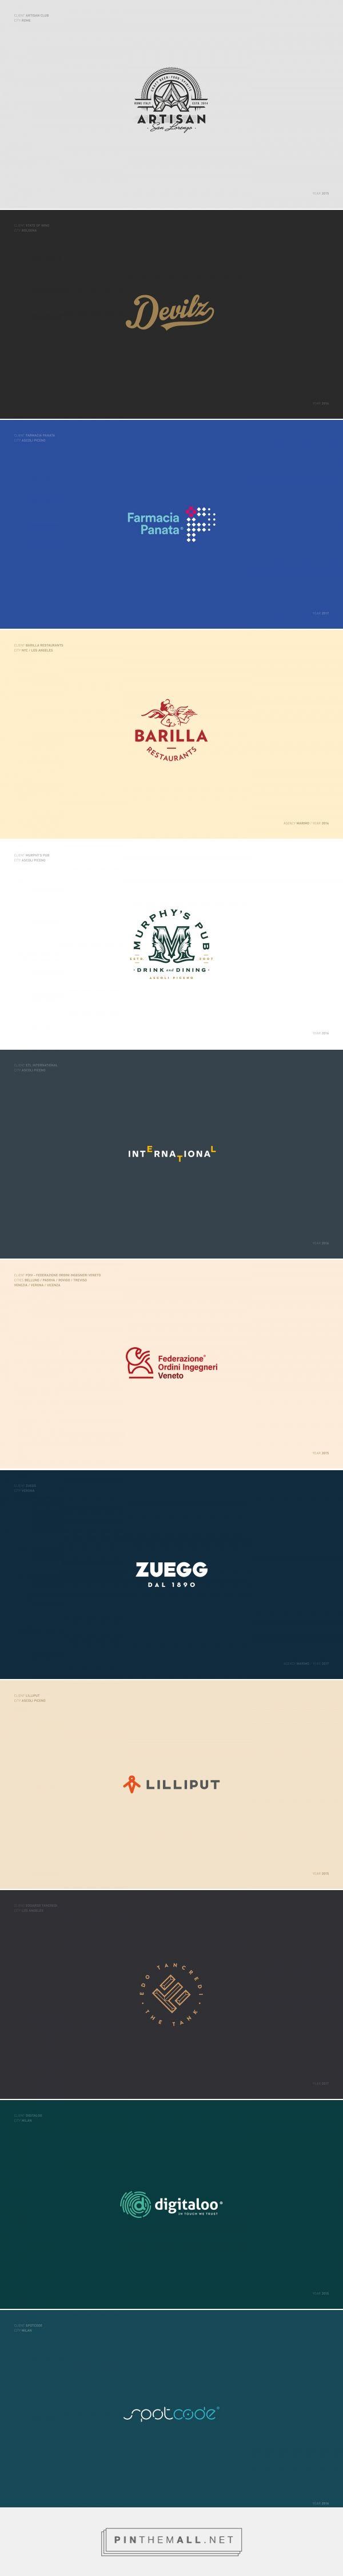 Logotypes & Marks 2015 18 on Behance created via s pinthemall